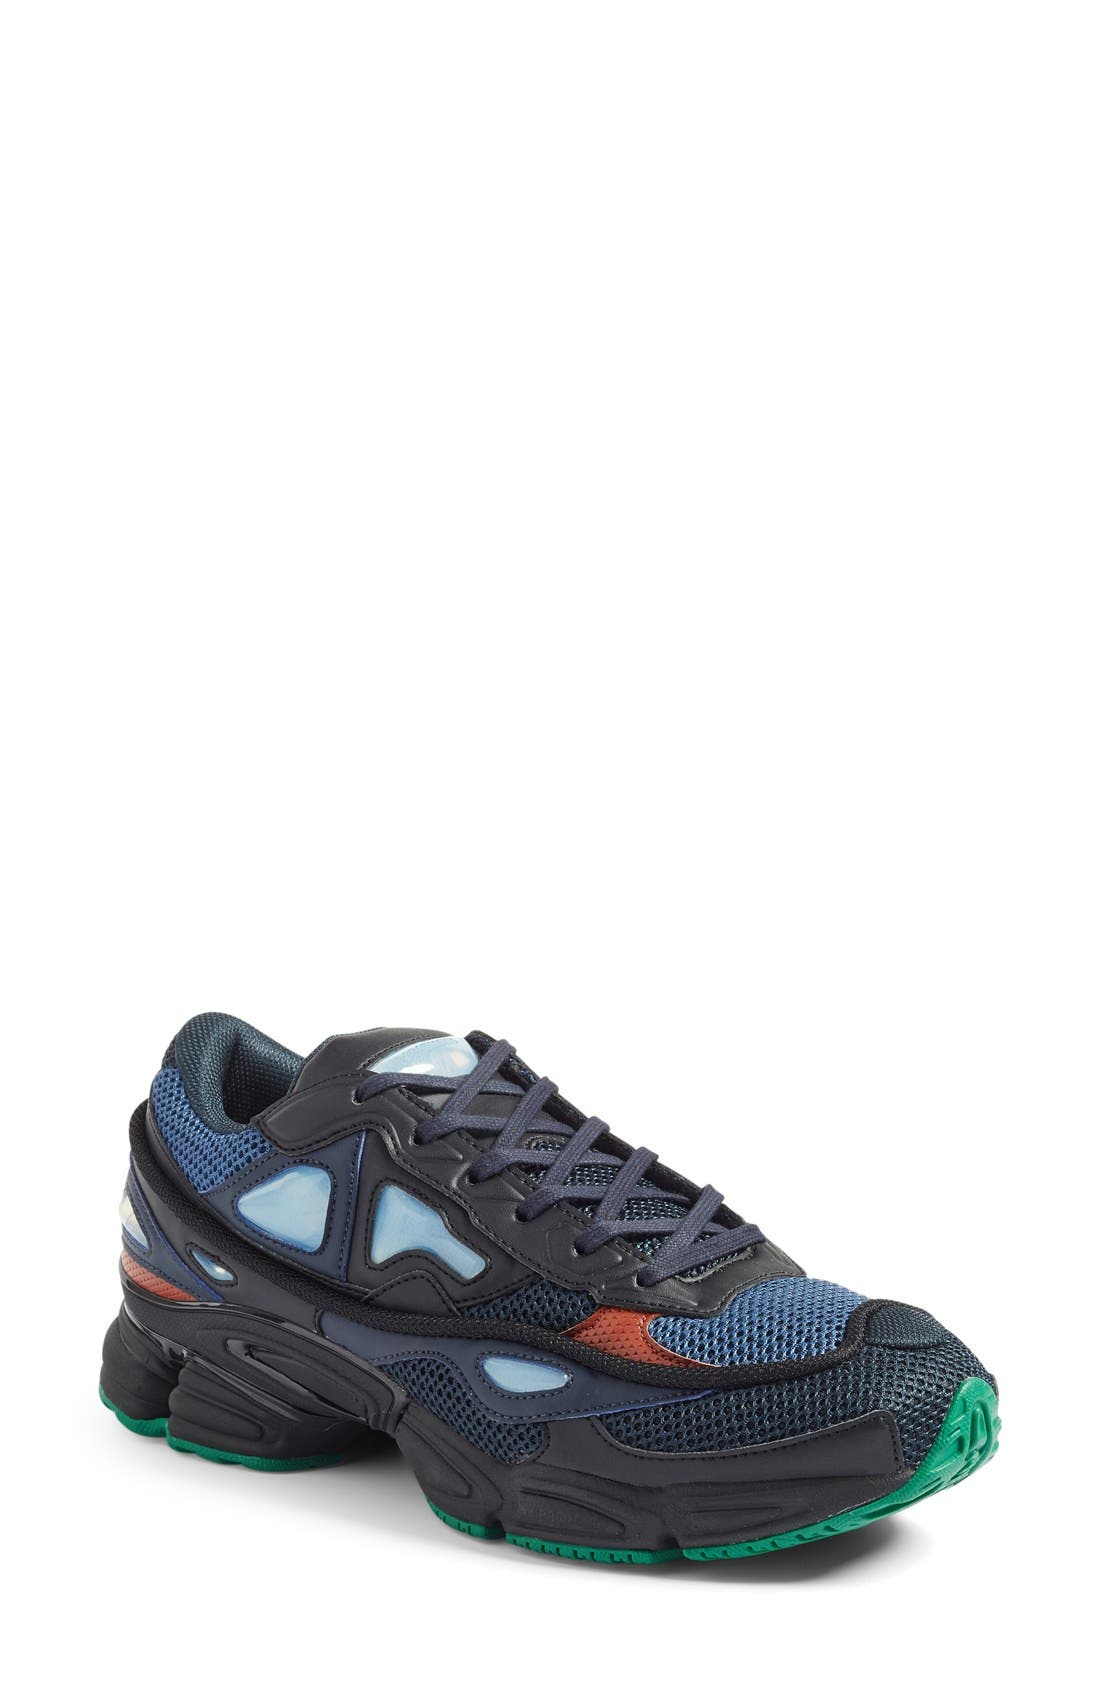 Alternate Image 1 Selected - adidas by Raf Simons Ozwego 2 Sneaker (Women)